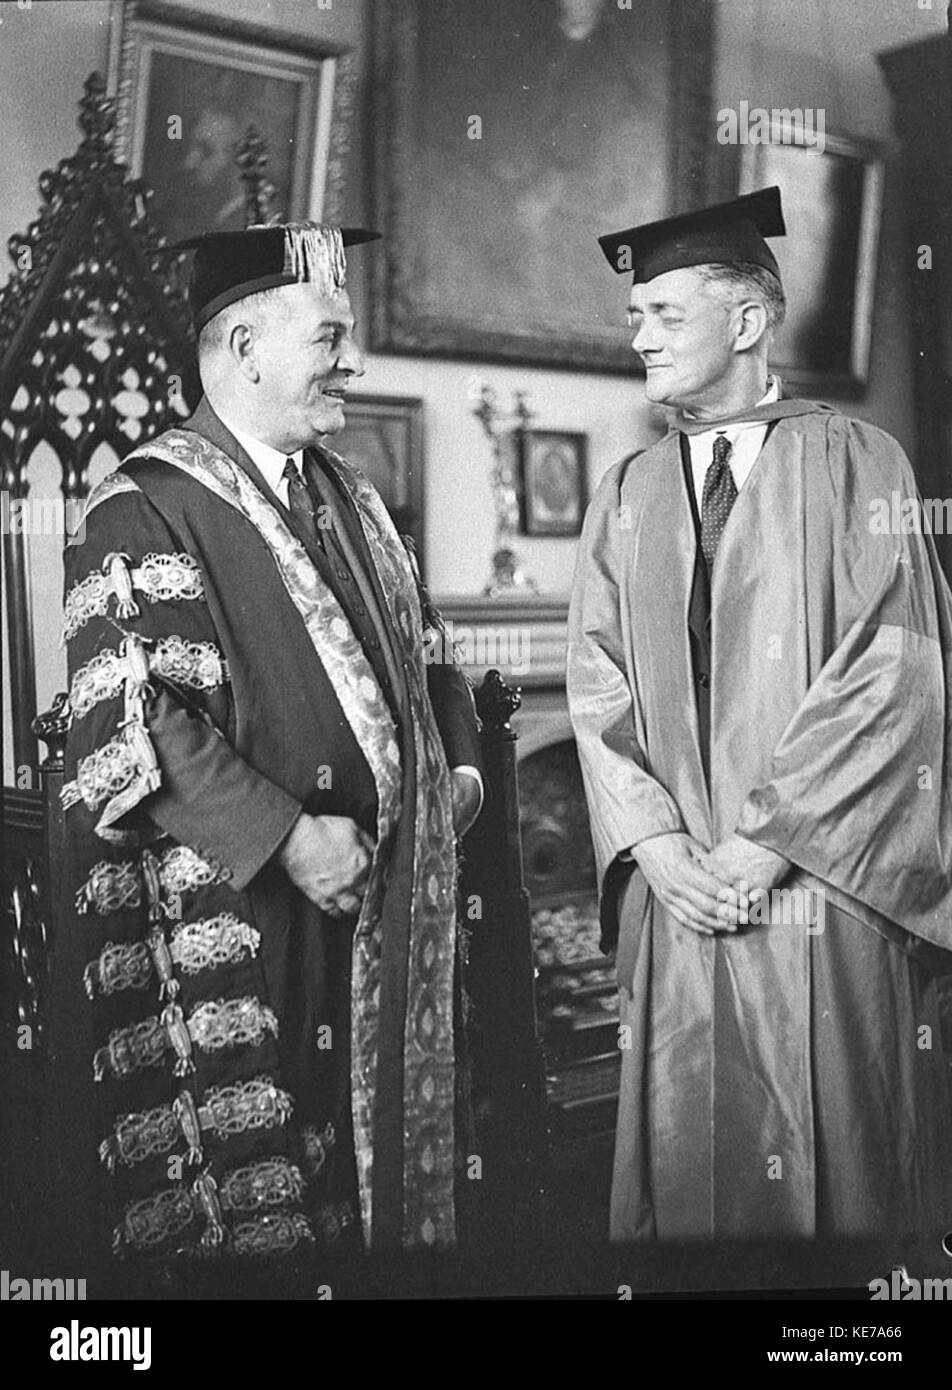 Honorary doctorate buy